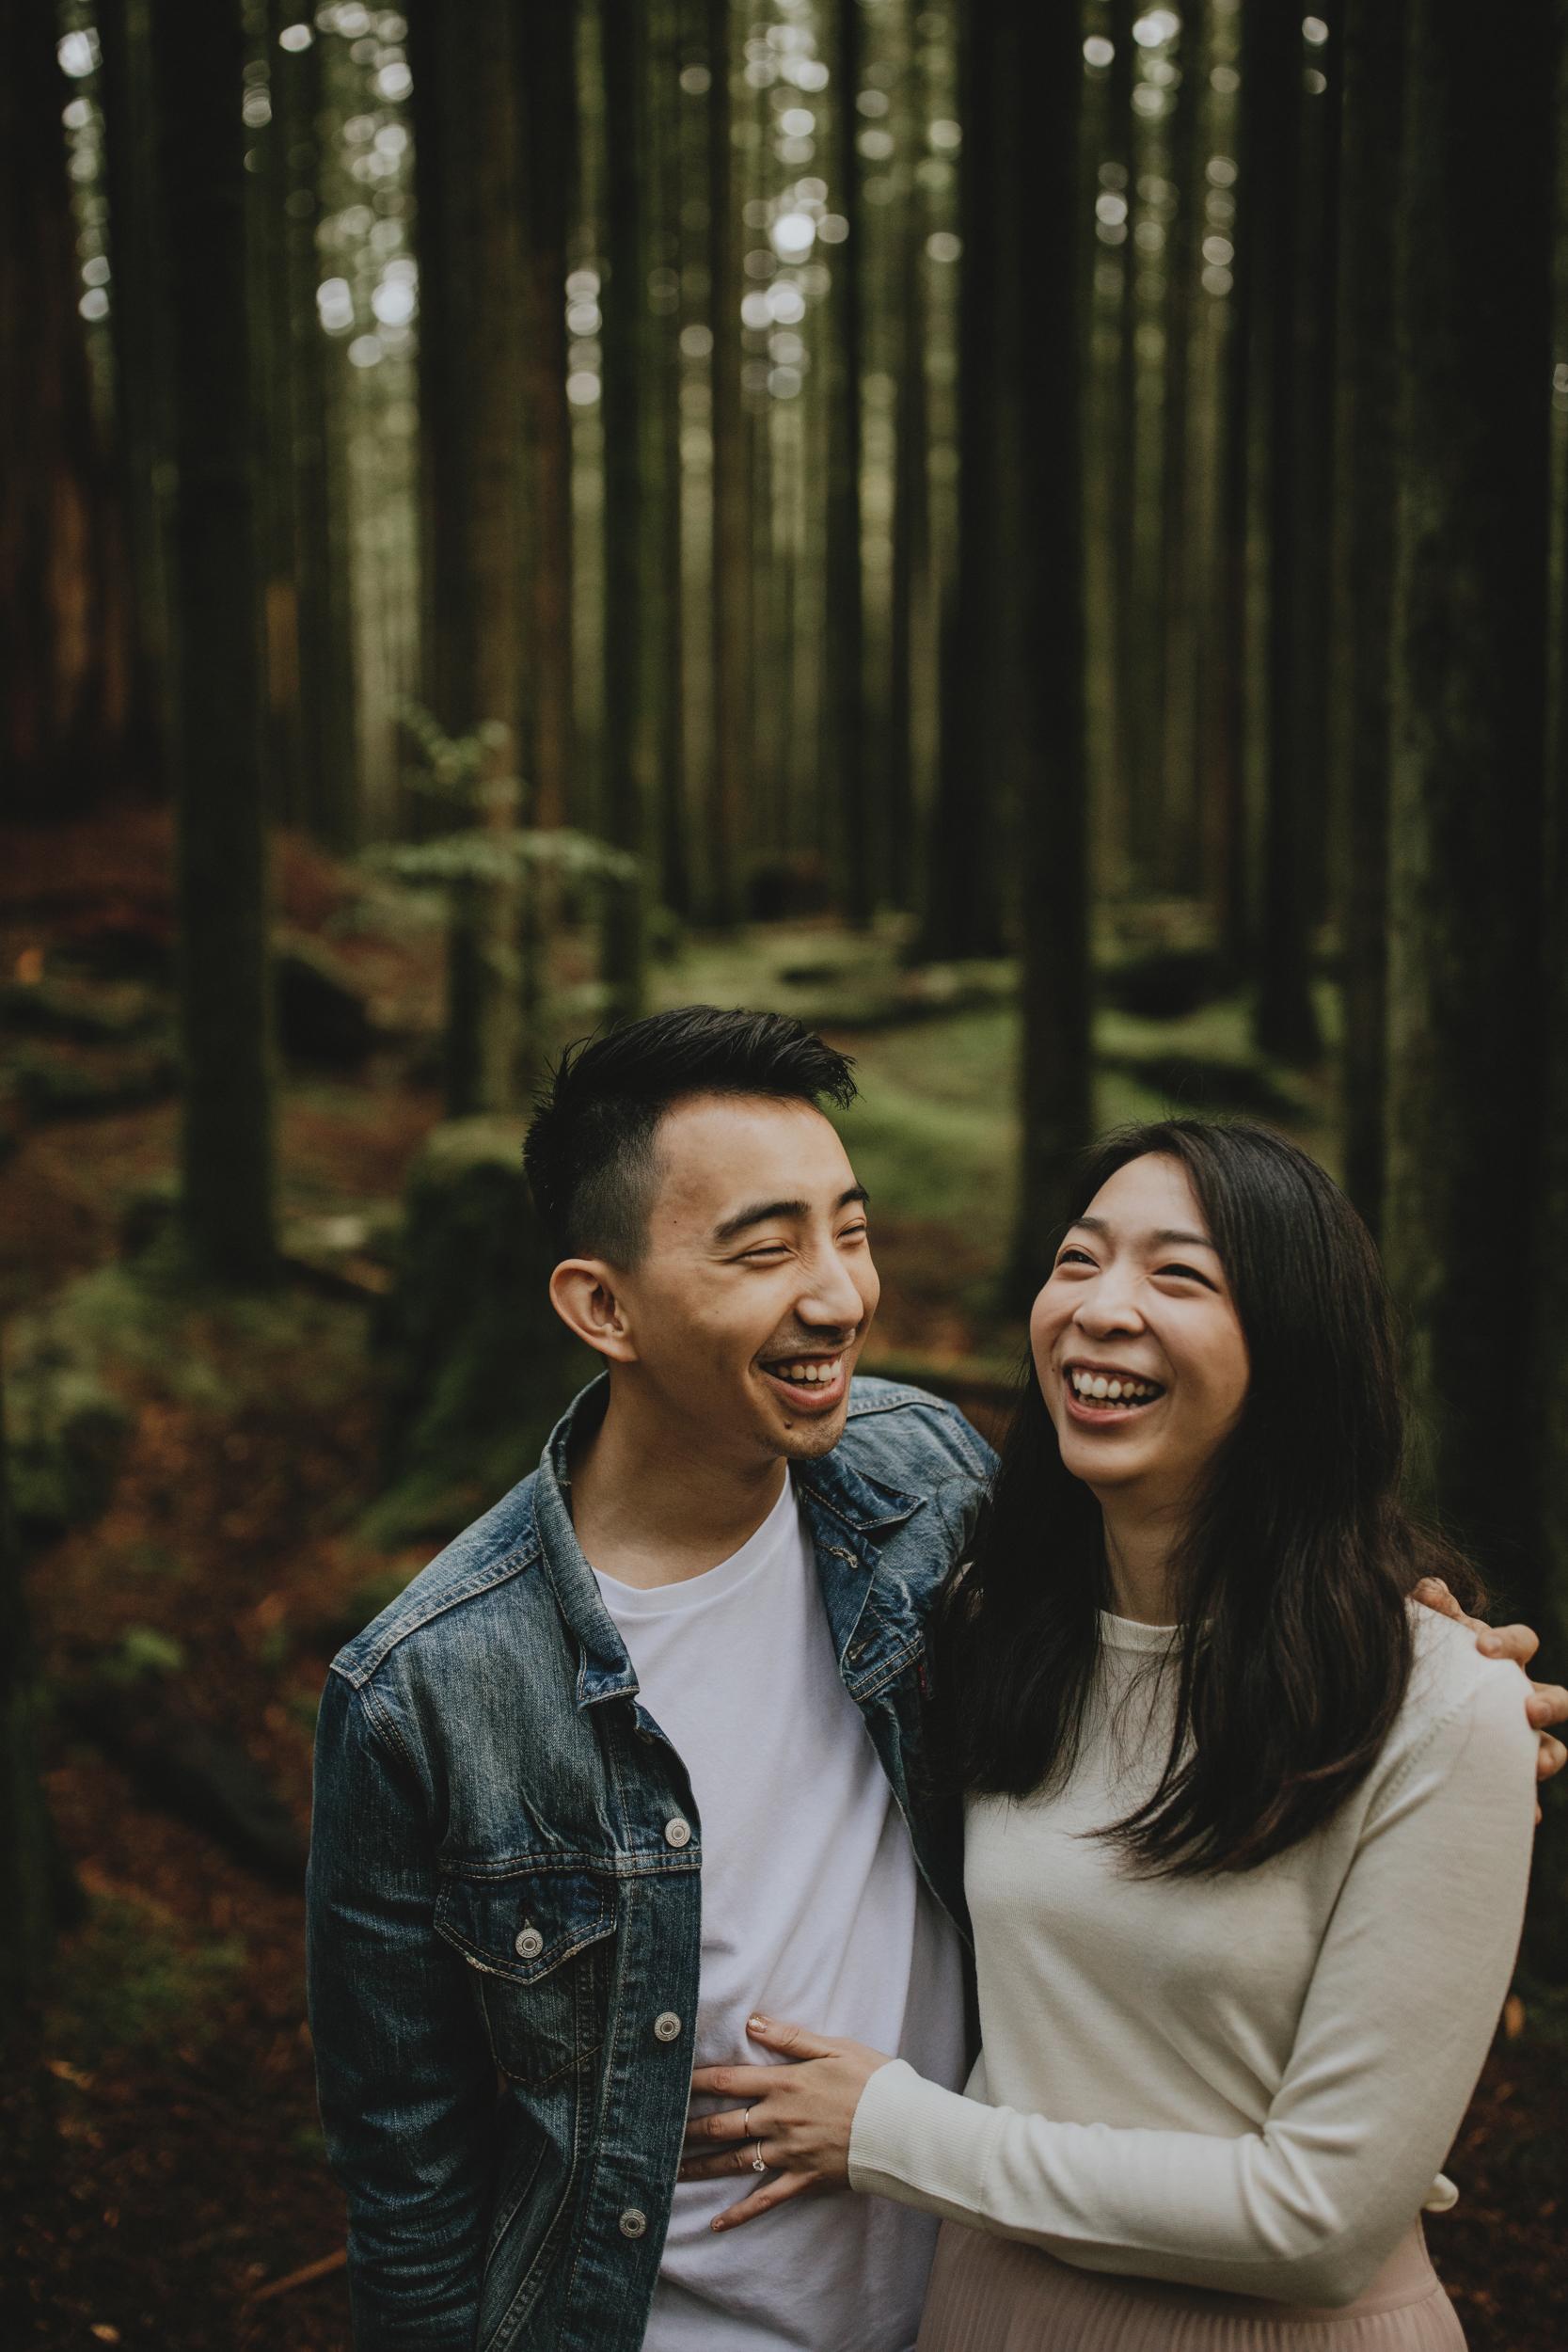 Golden-Ears-Park-Forest-Engagement-Vancouver-4.jpg